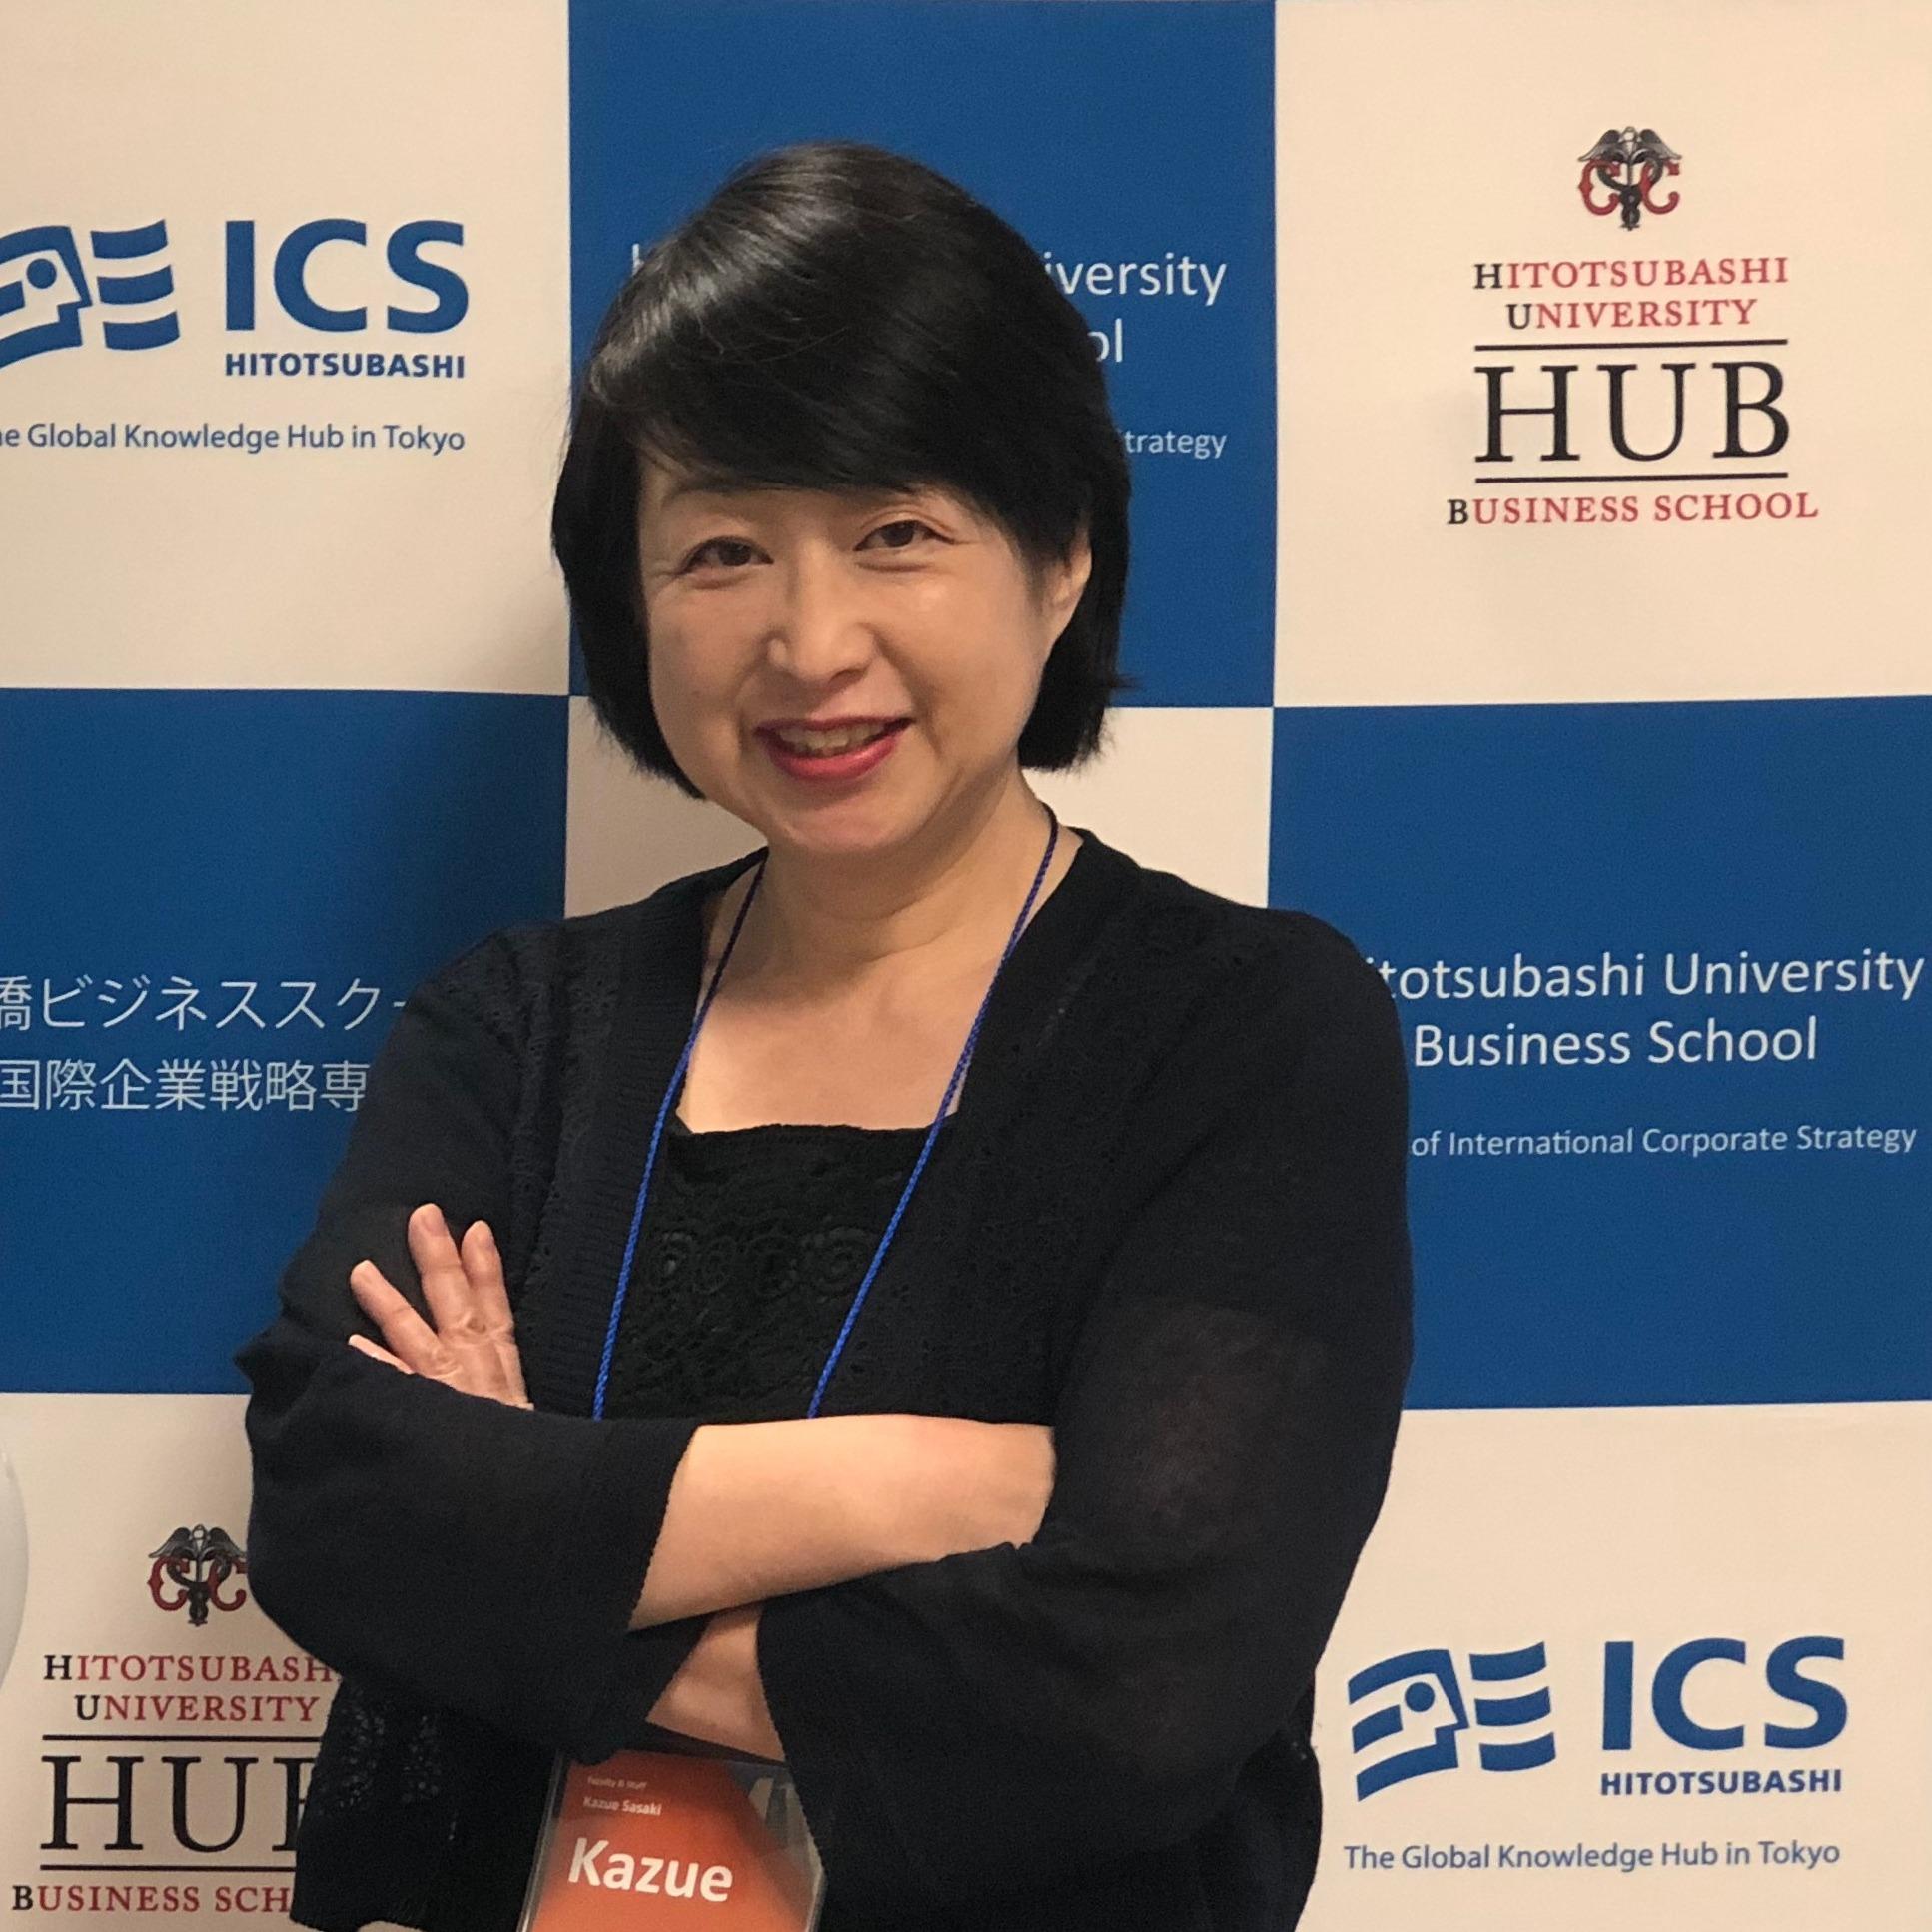 Hitotsubashi ICS Career Services Director Kazue Sasaki